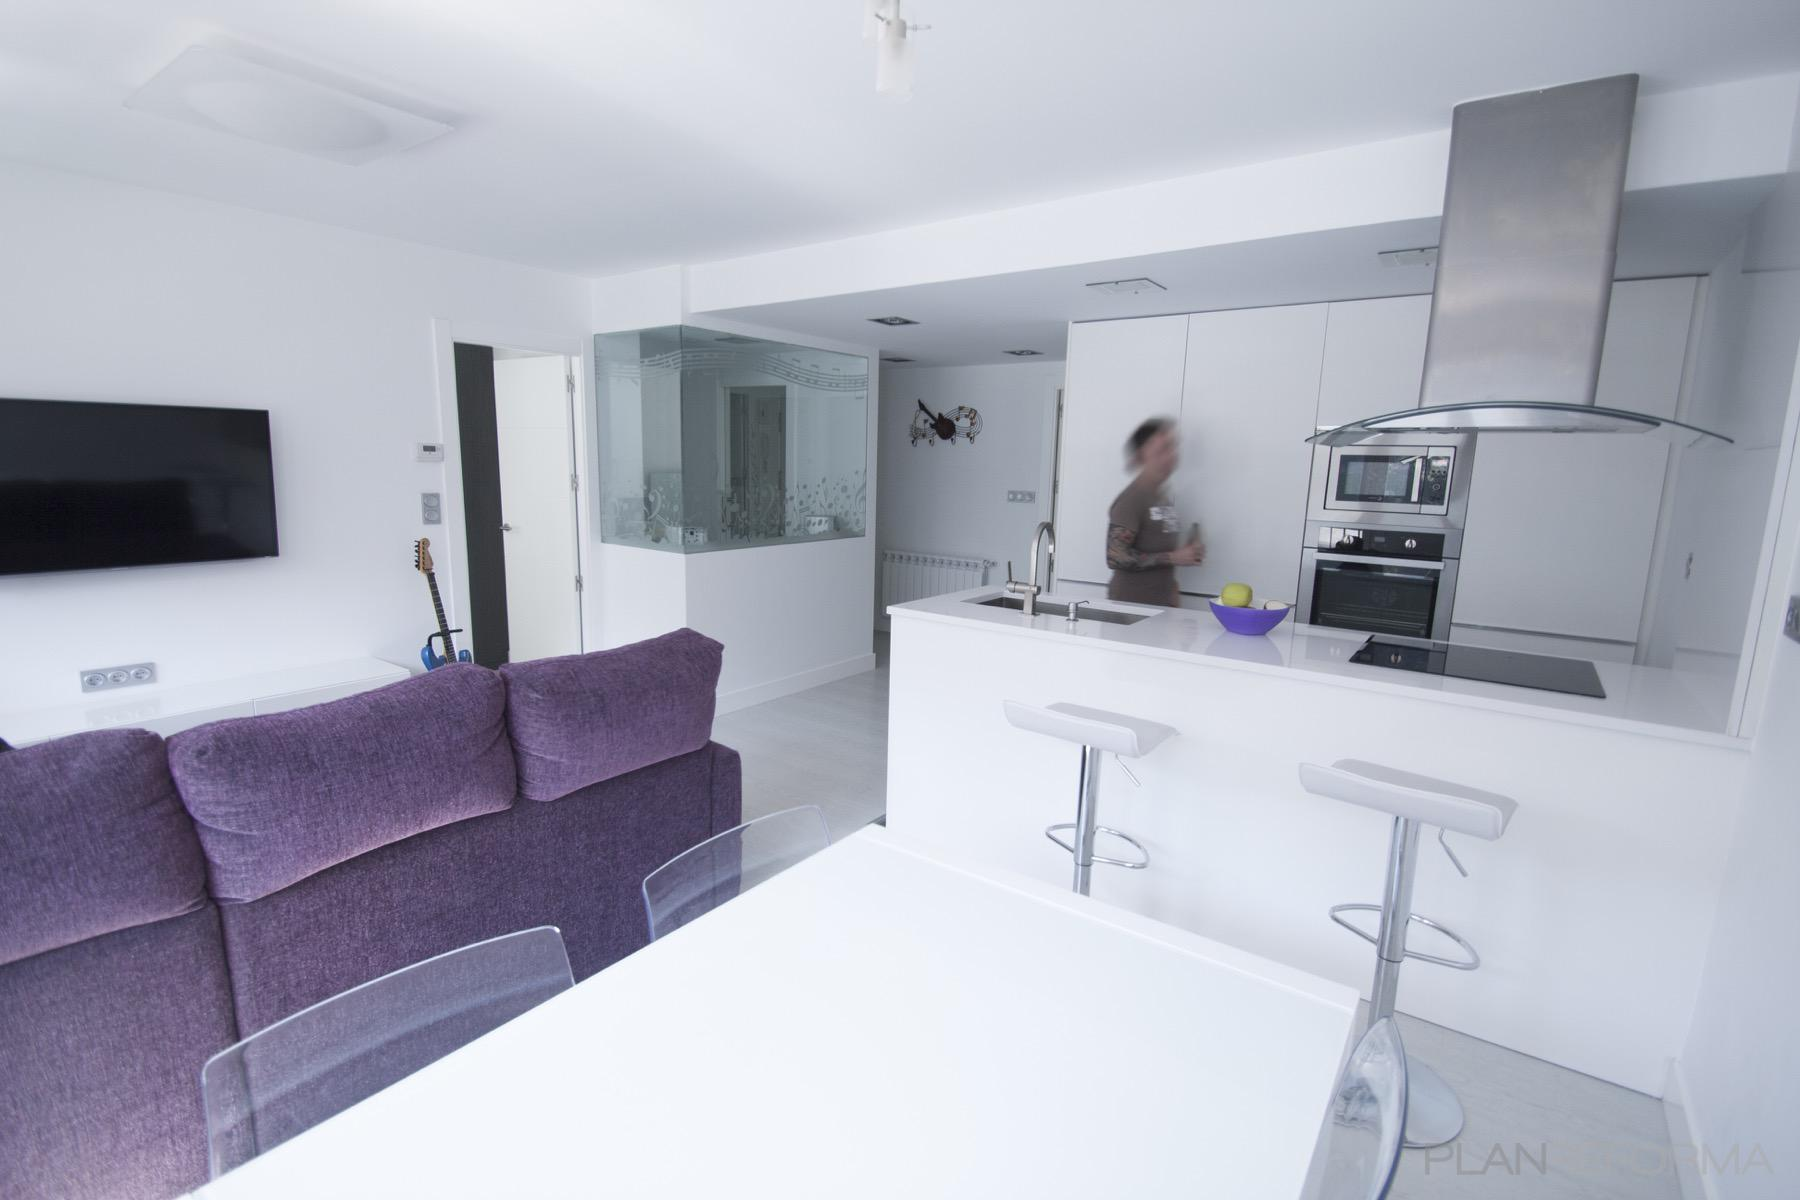 Comedor cocina salon estilo moderno color violeta for Comedor moderno blanco